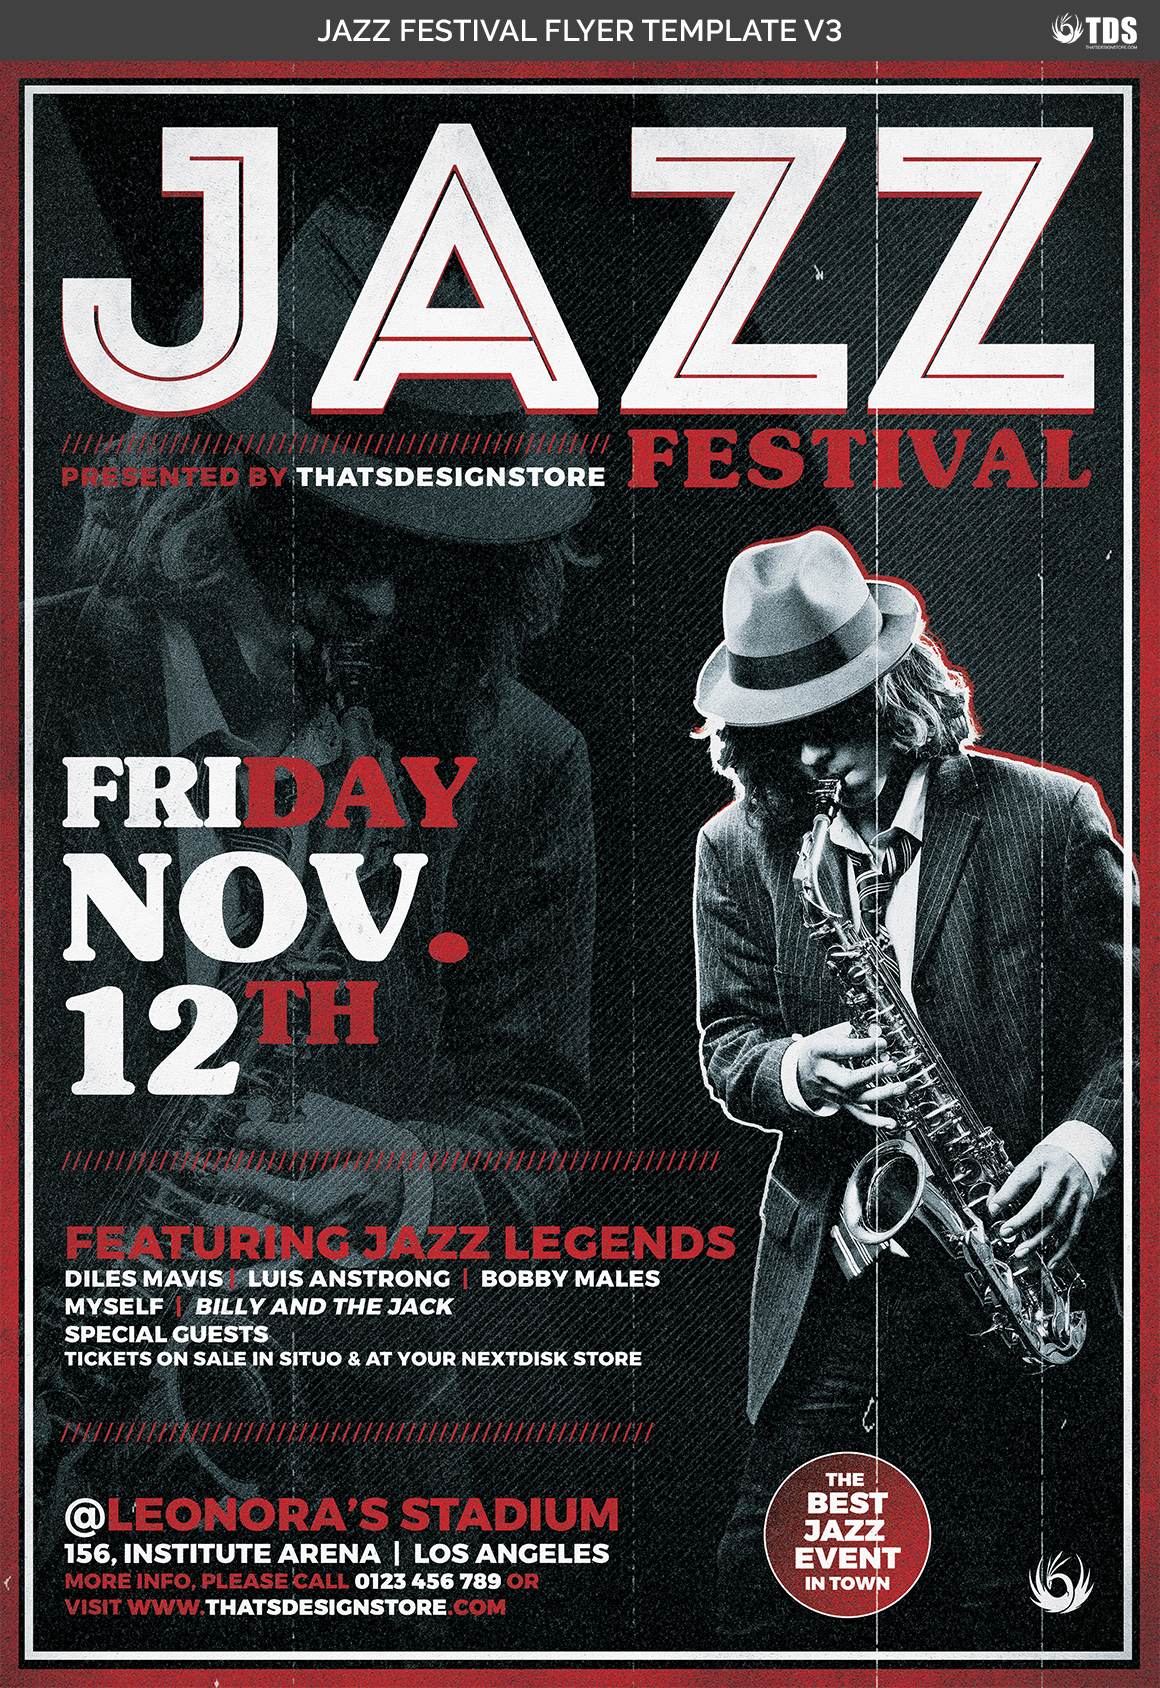 Jazz Festival Flyer Template V3 example image 4